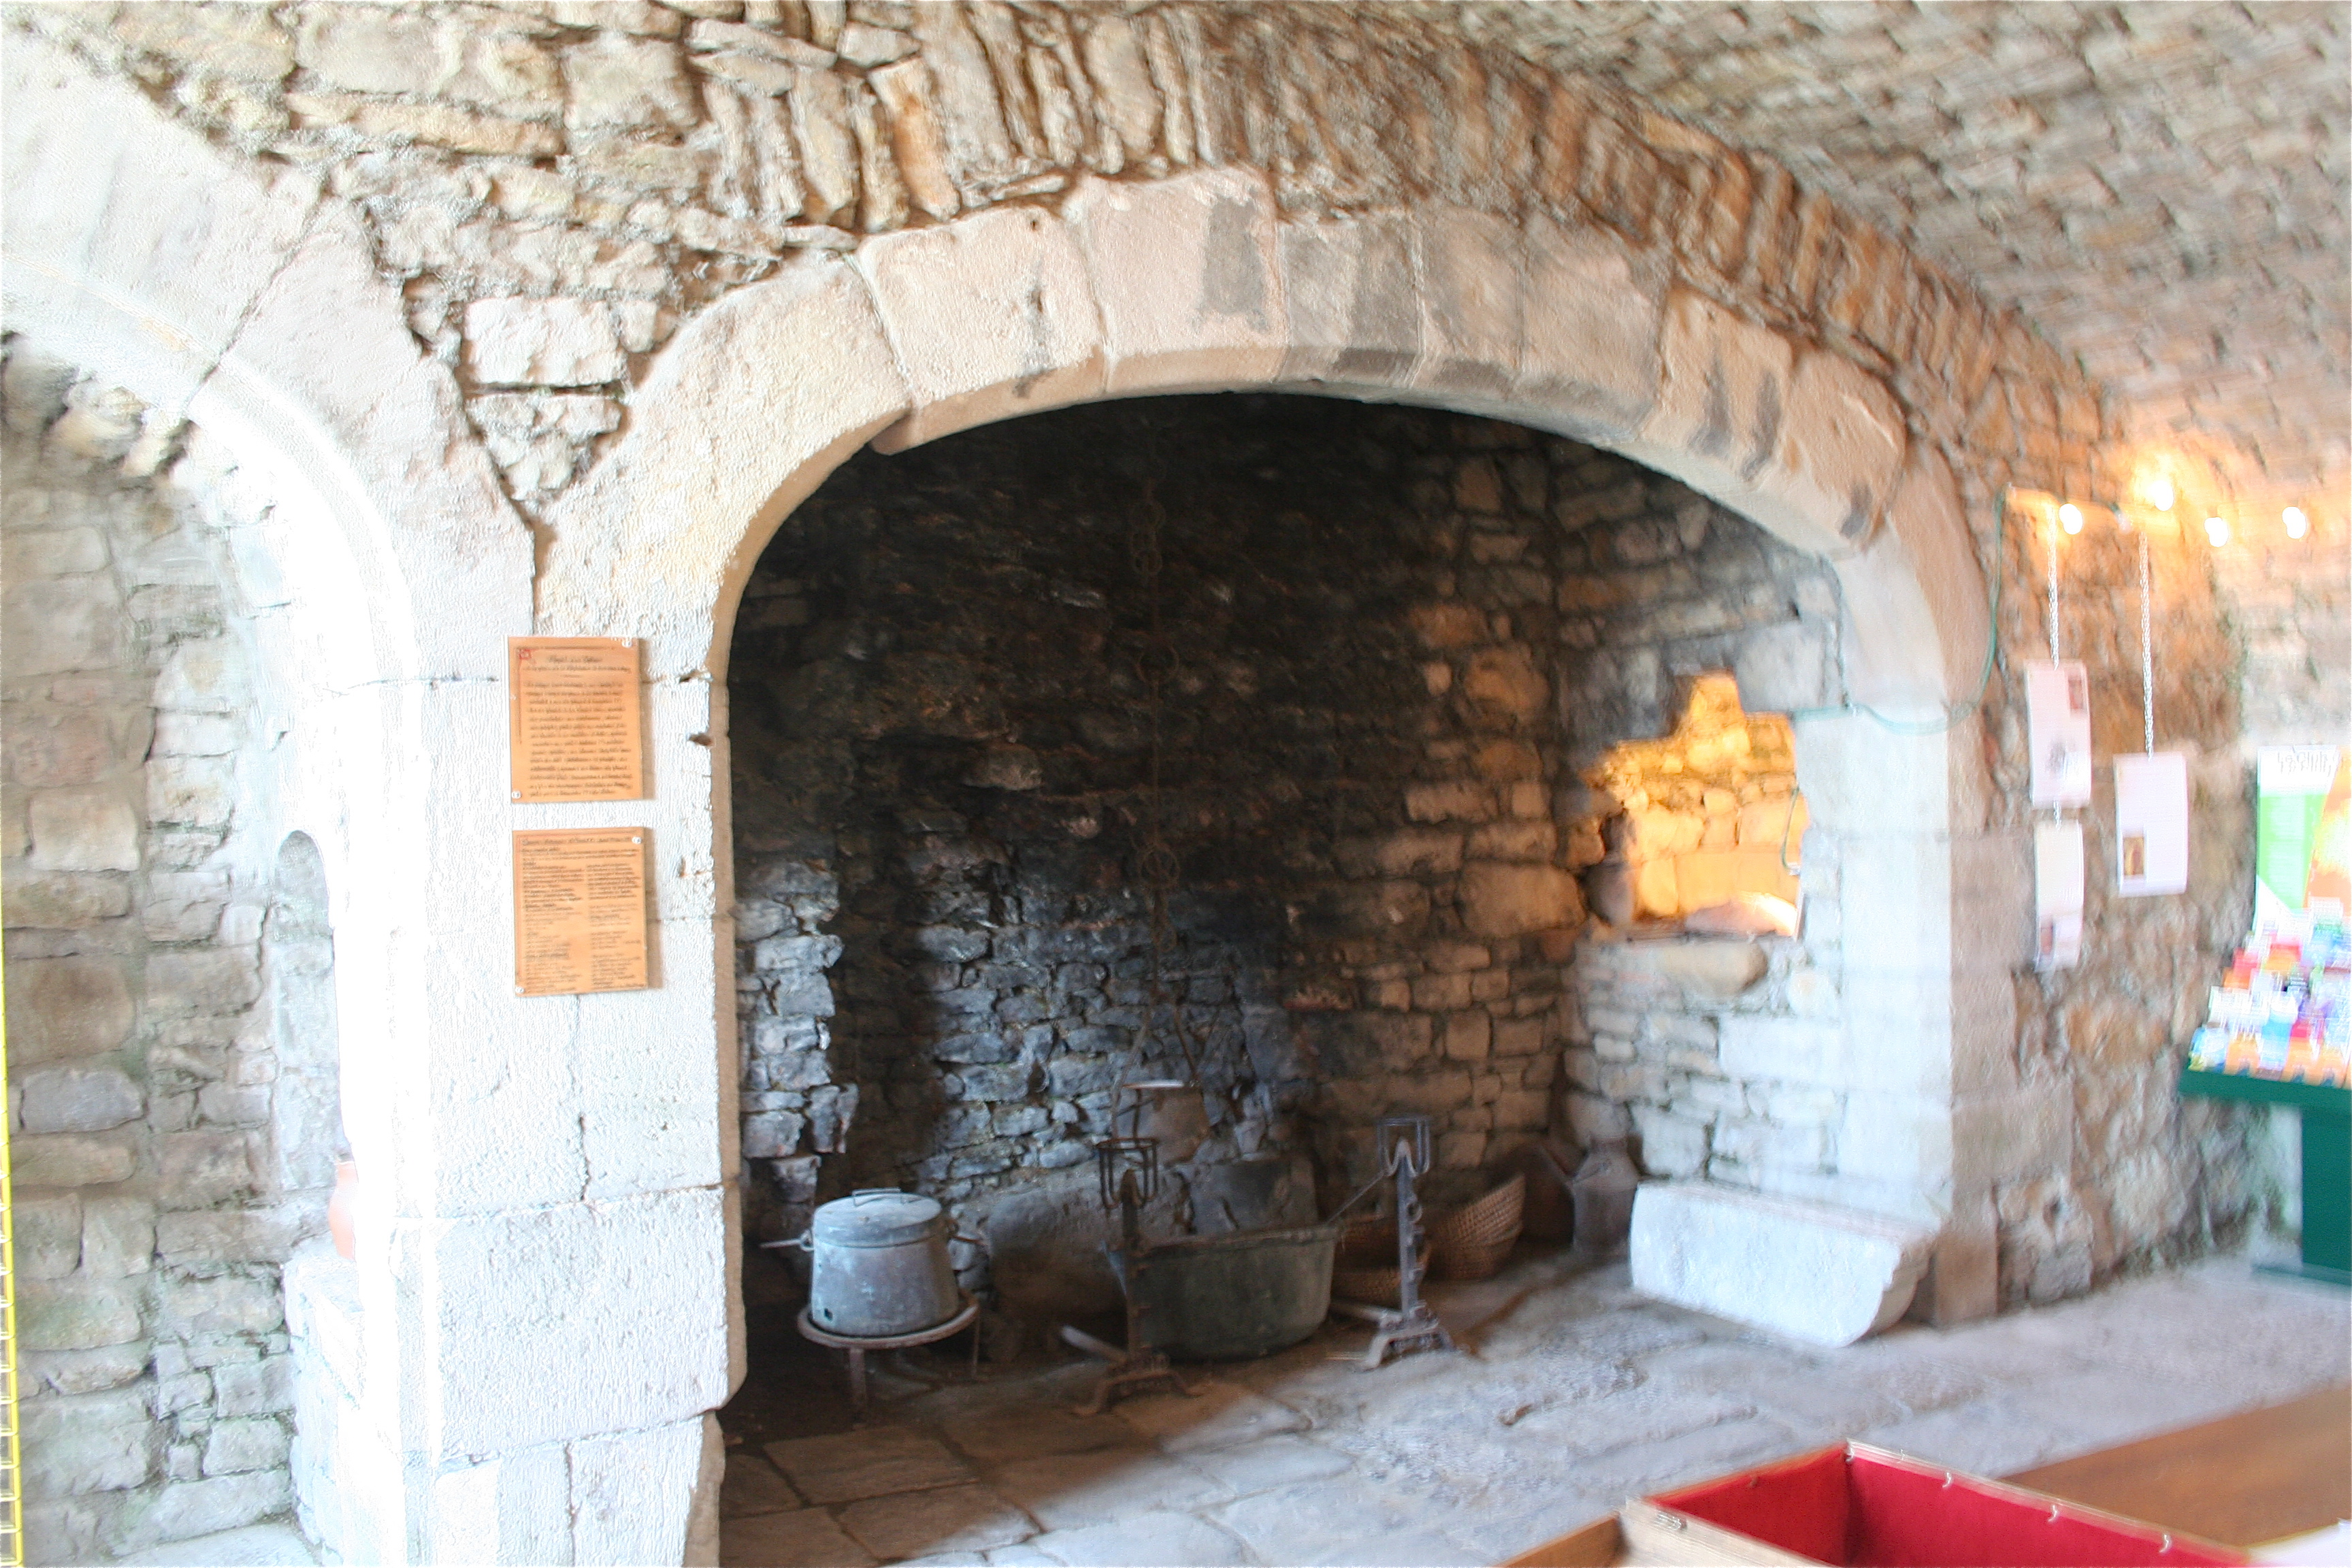 File severac le chateau cheminee chateau jpg wikimedia - Contour de cheminee decoratif ...